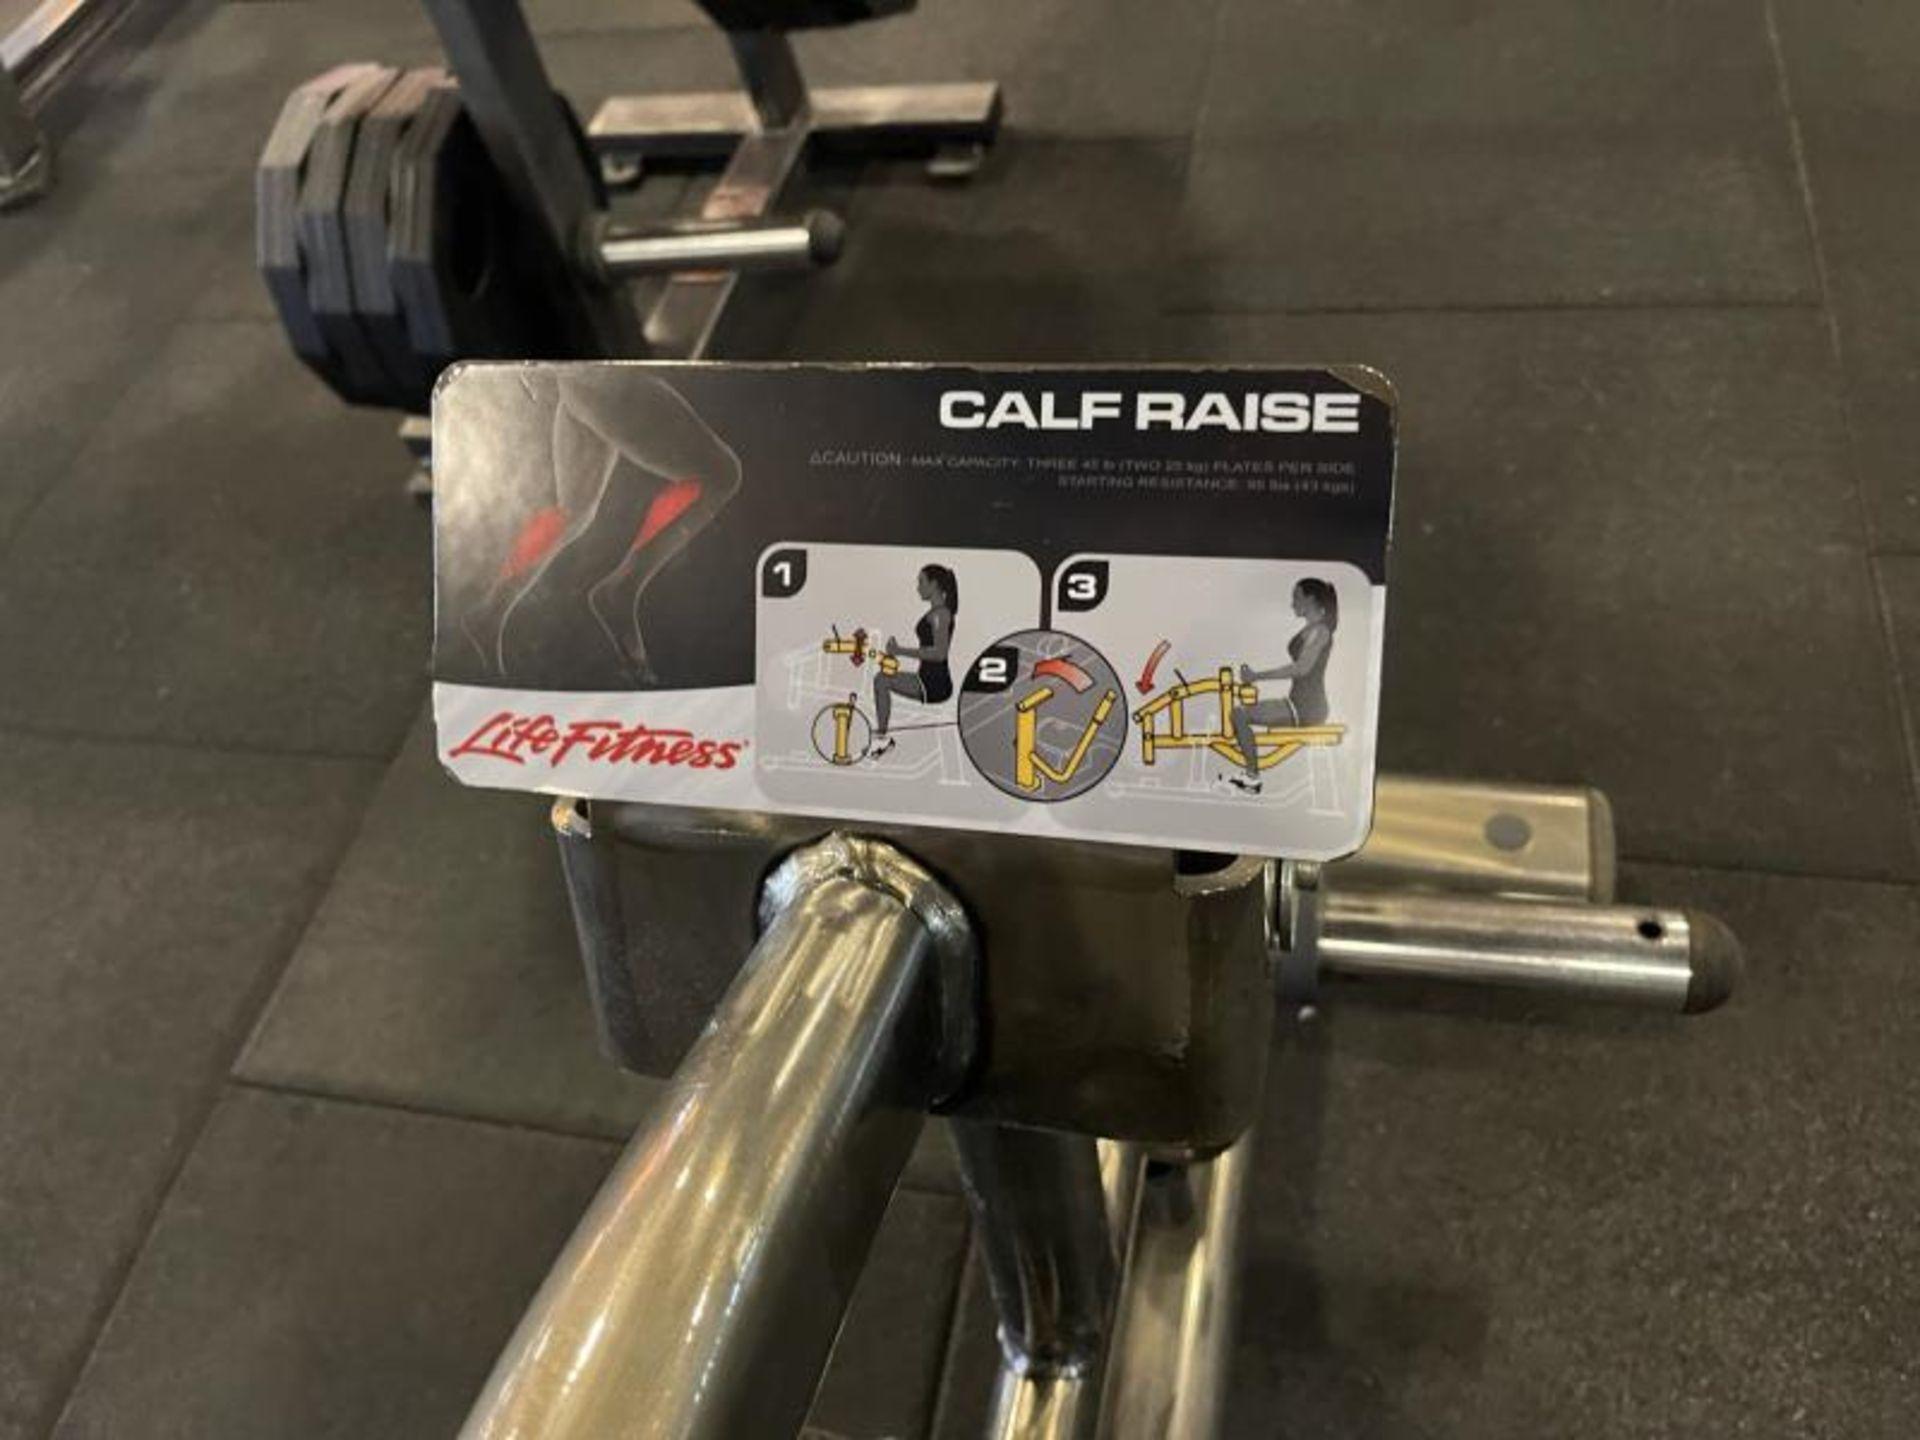 Life Fitness Calf Raise M: SPLCALF - Image 3 of 5